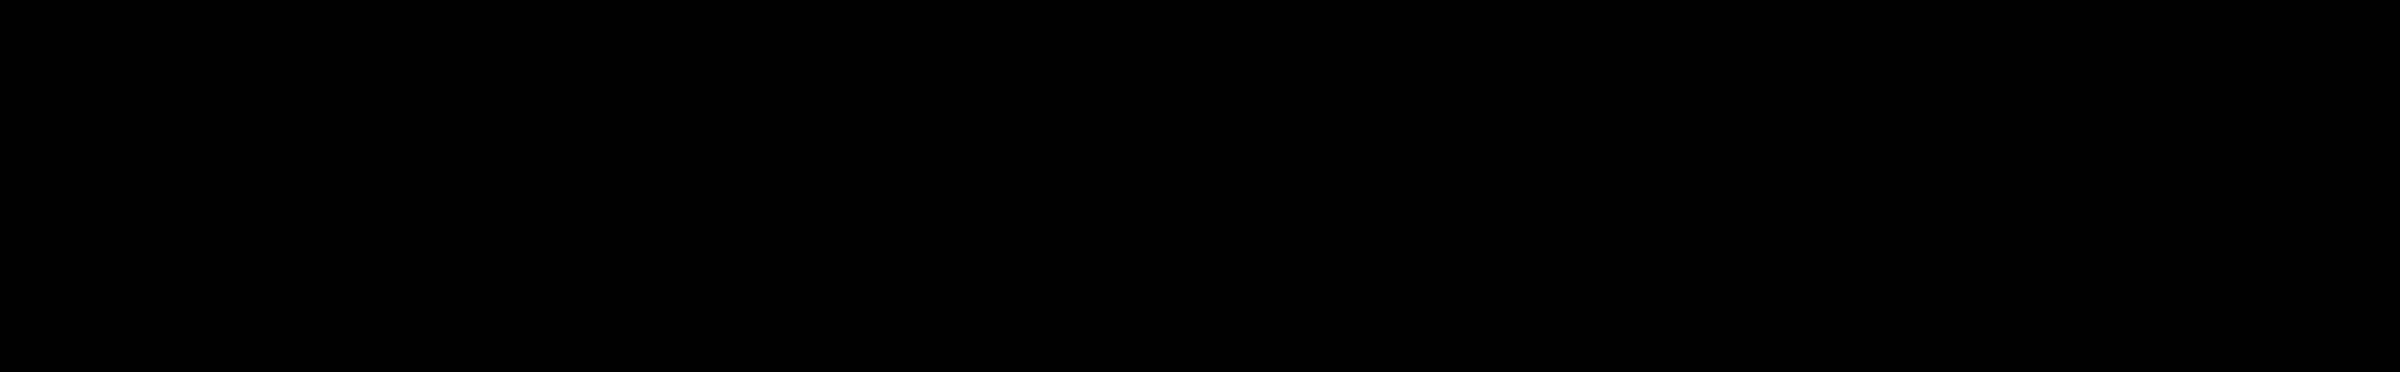 Divider PNG HD - 139020